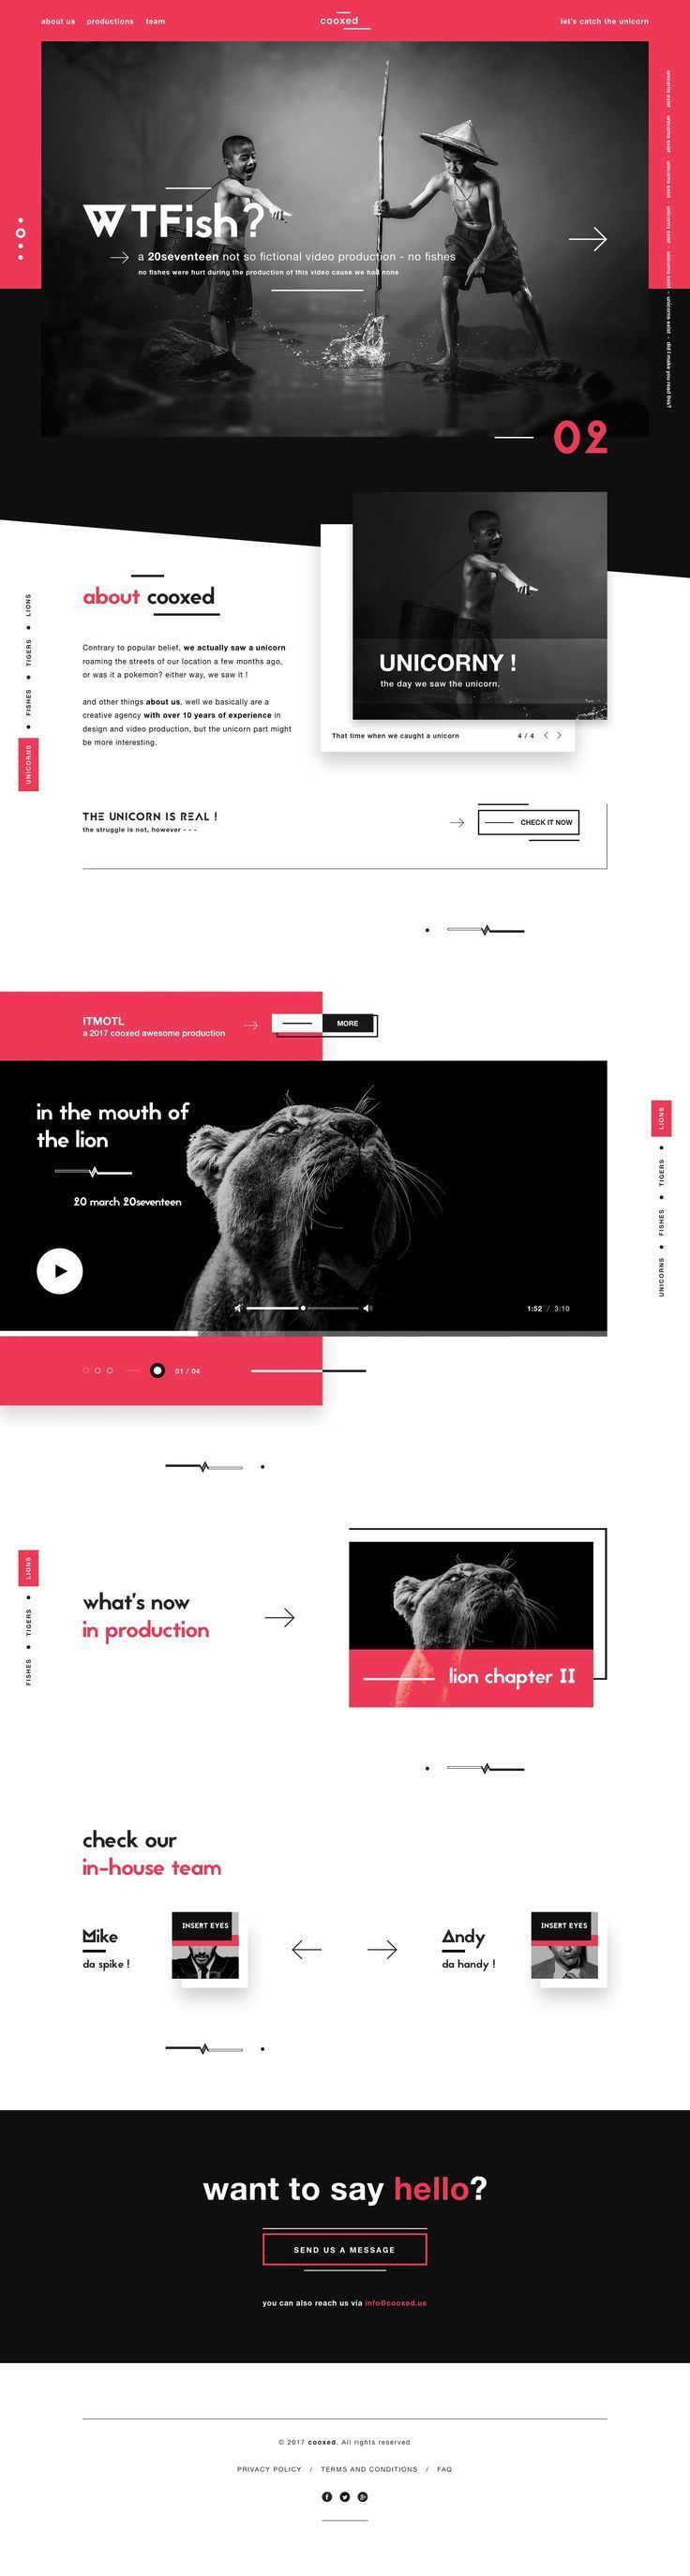 Cooxed Funky Digital Agency #MobileWebDesign #WebSiteDesign